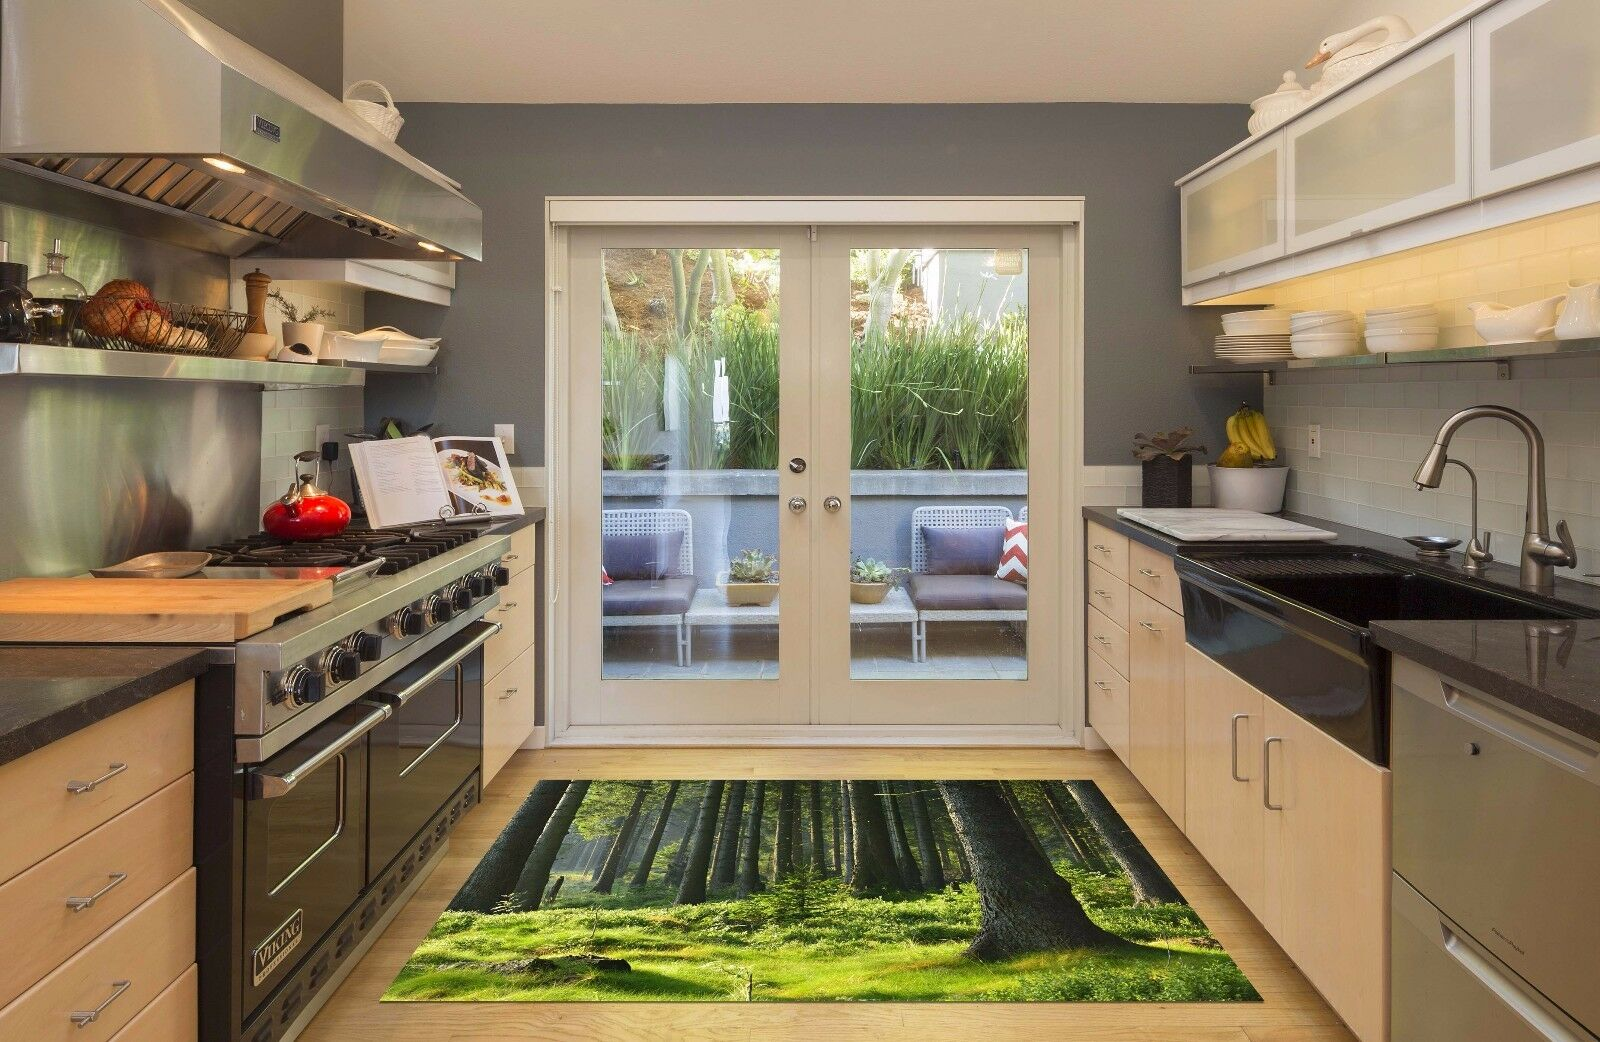 3D Forest Lawn 888 Kitchen Mat Floor Murals Wall Print Wall Deco UK Carly